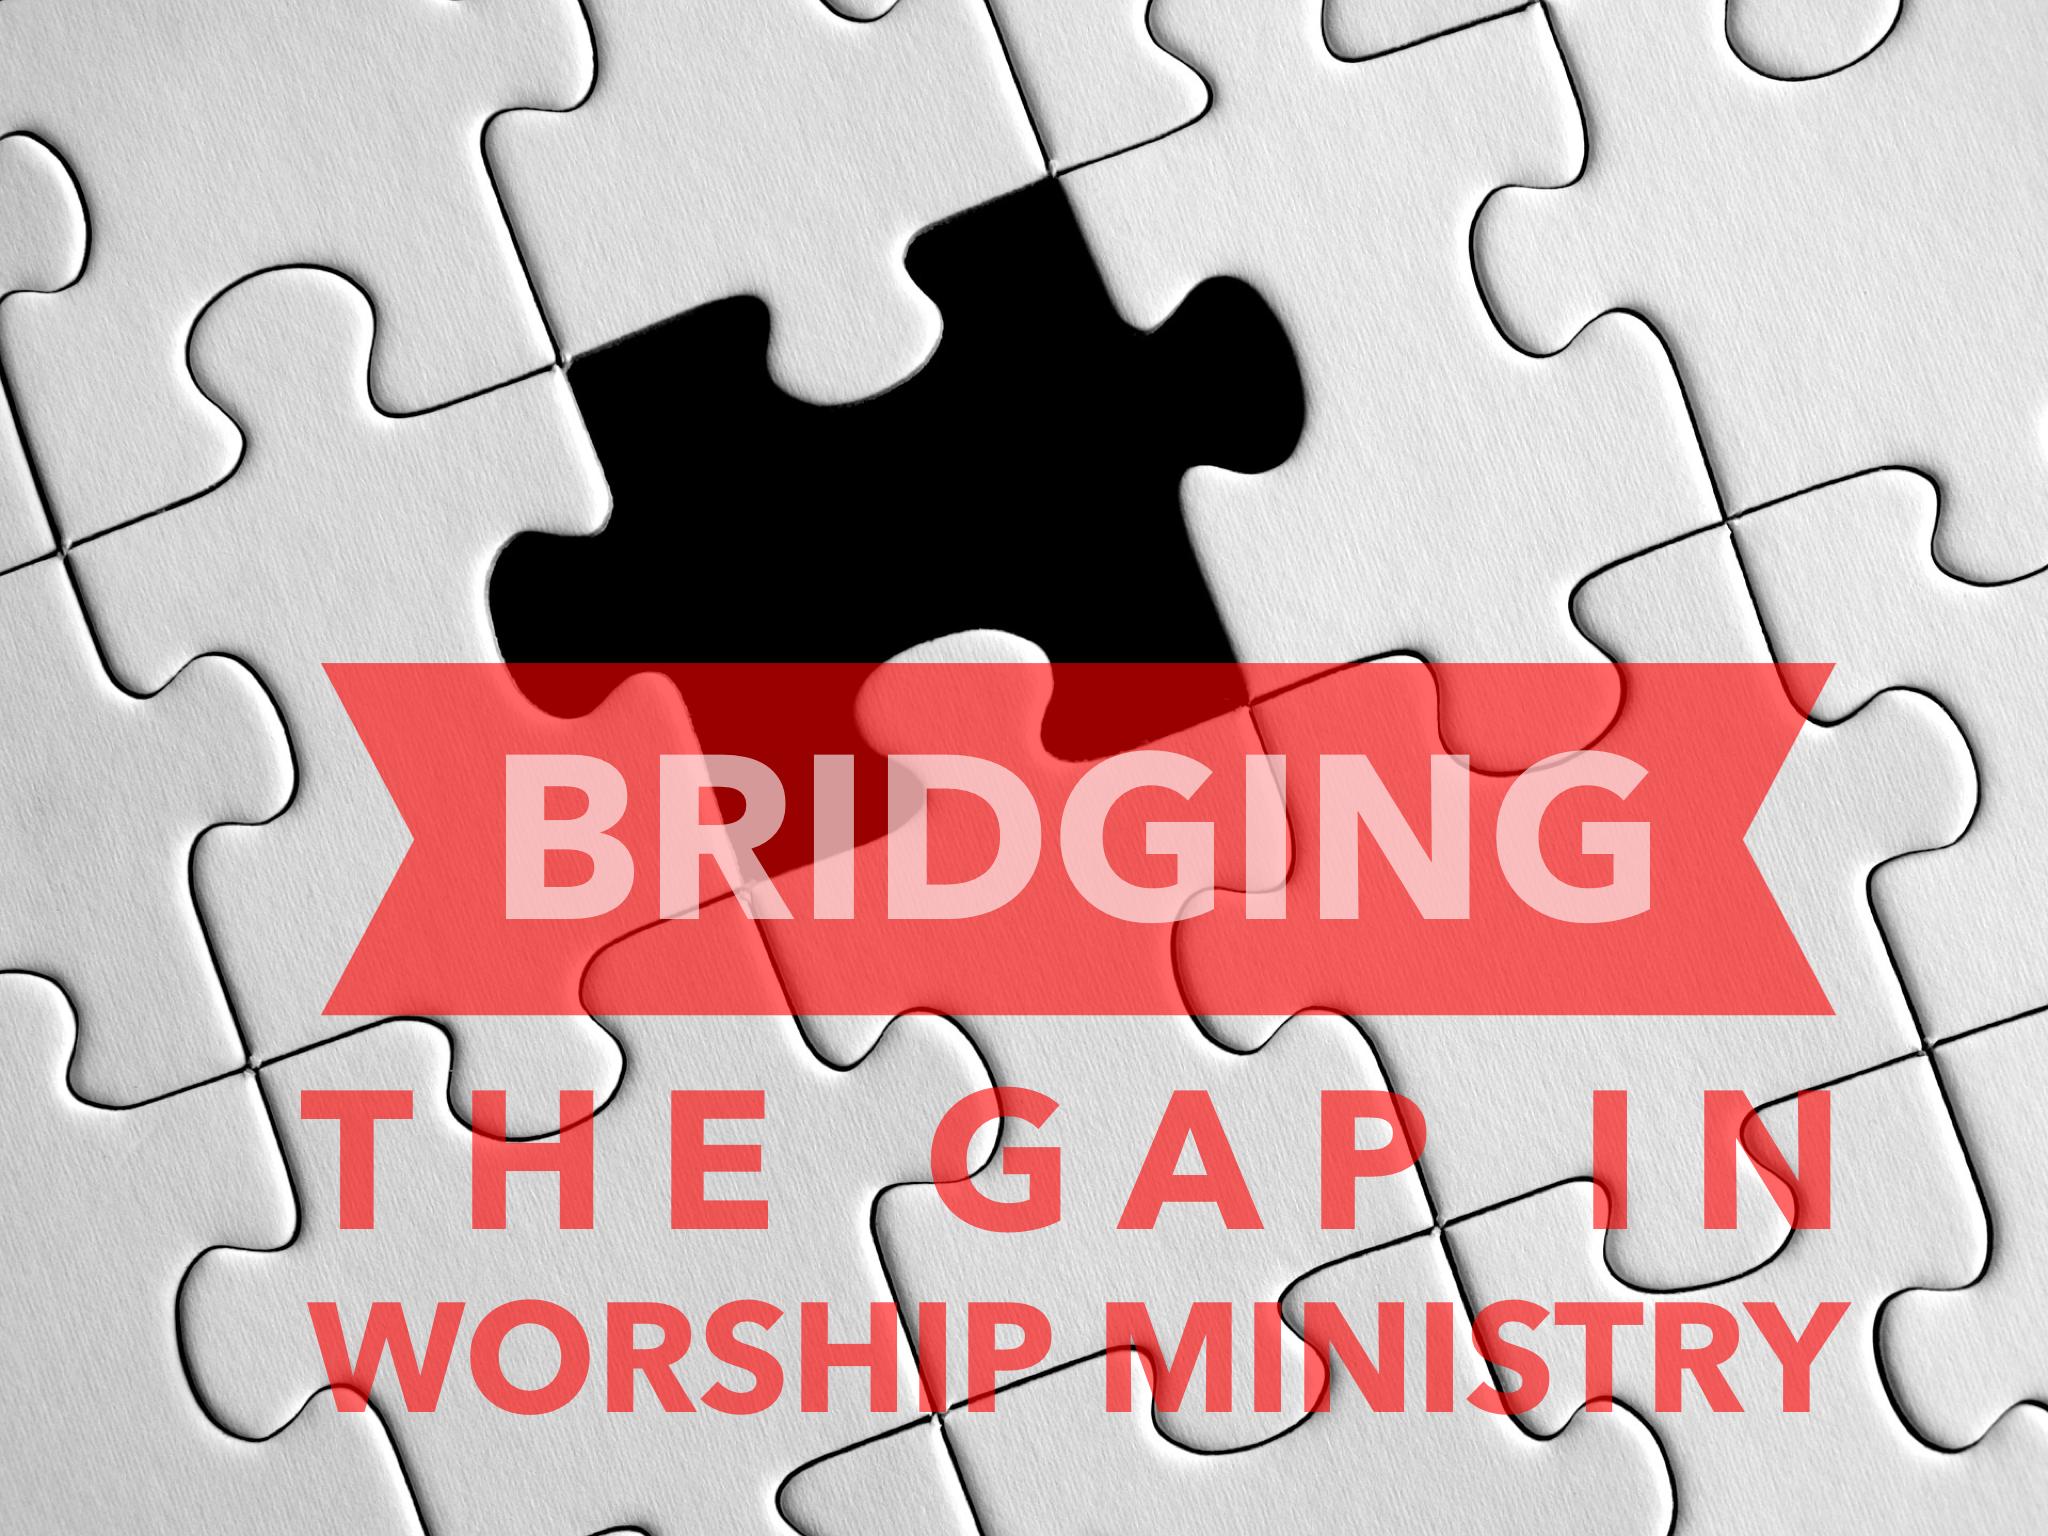 BRIDGING THE GAP IN WORSHIP MINISTRY